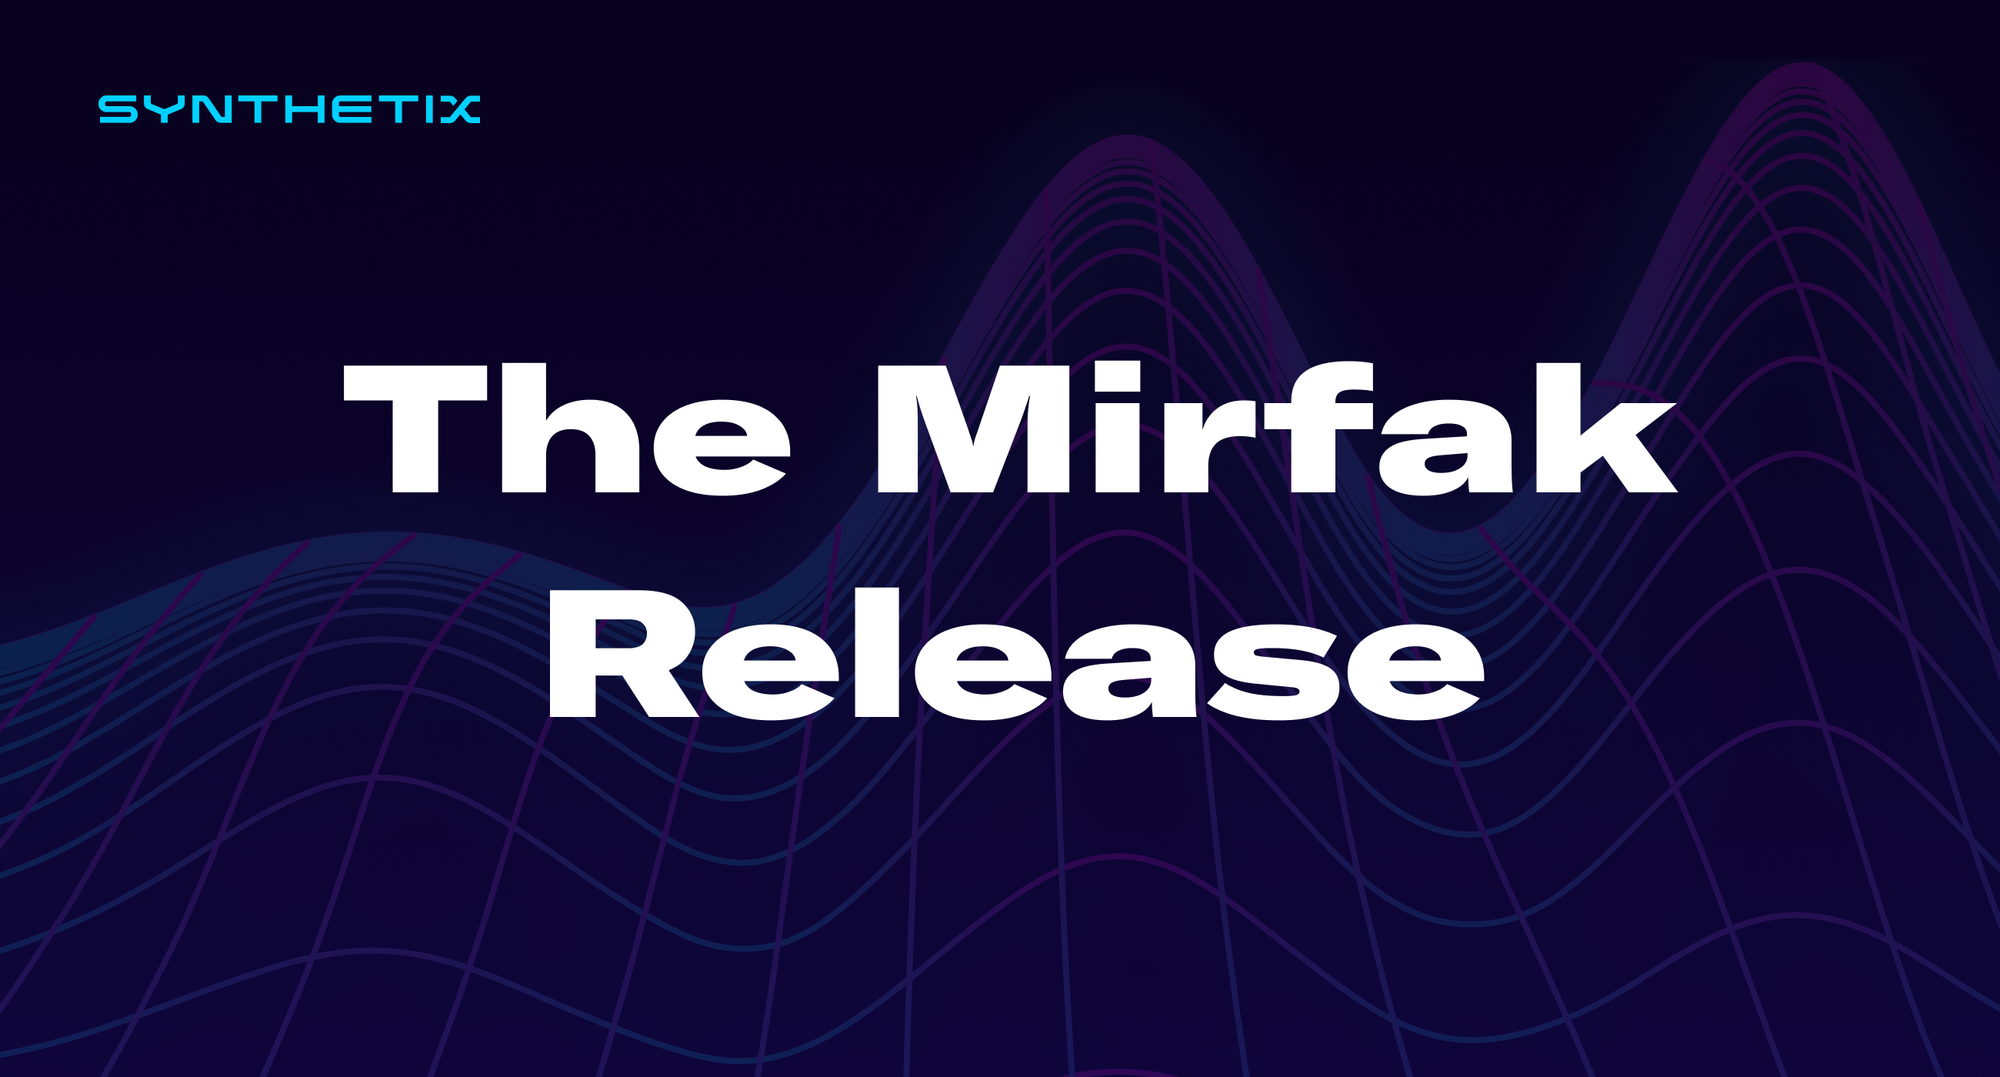 The Mirfak Release